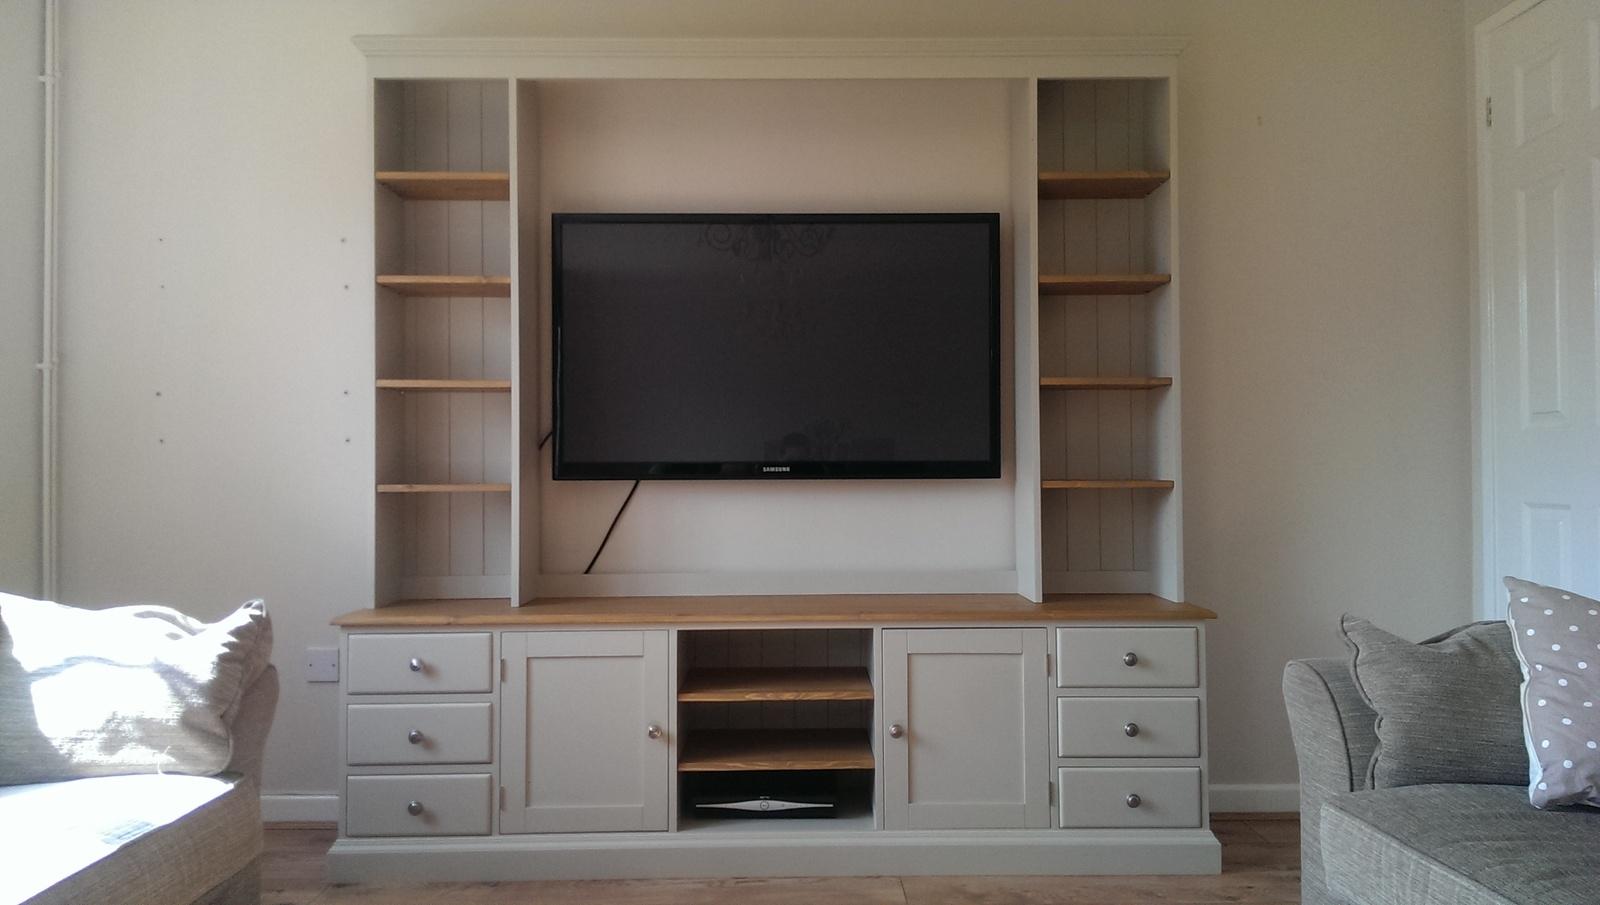 Tv Entertainment Unit Bespoke Living Room Furniture Pine Regarding Bespoke Tv Unit (#15 of 15)